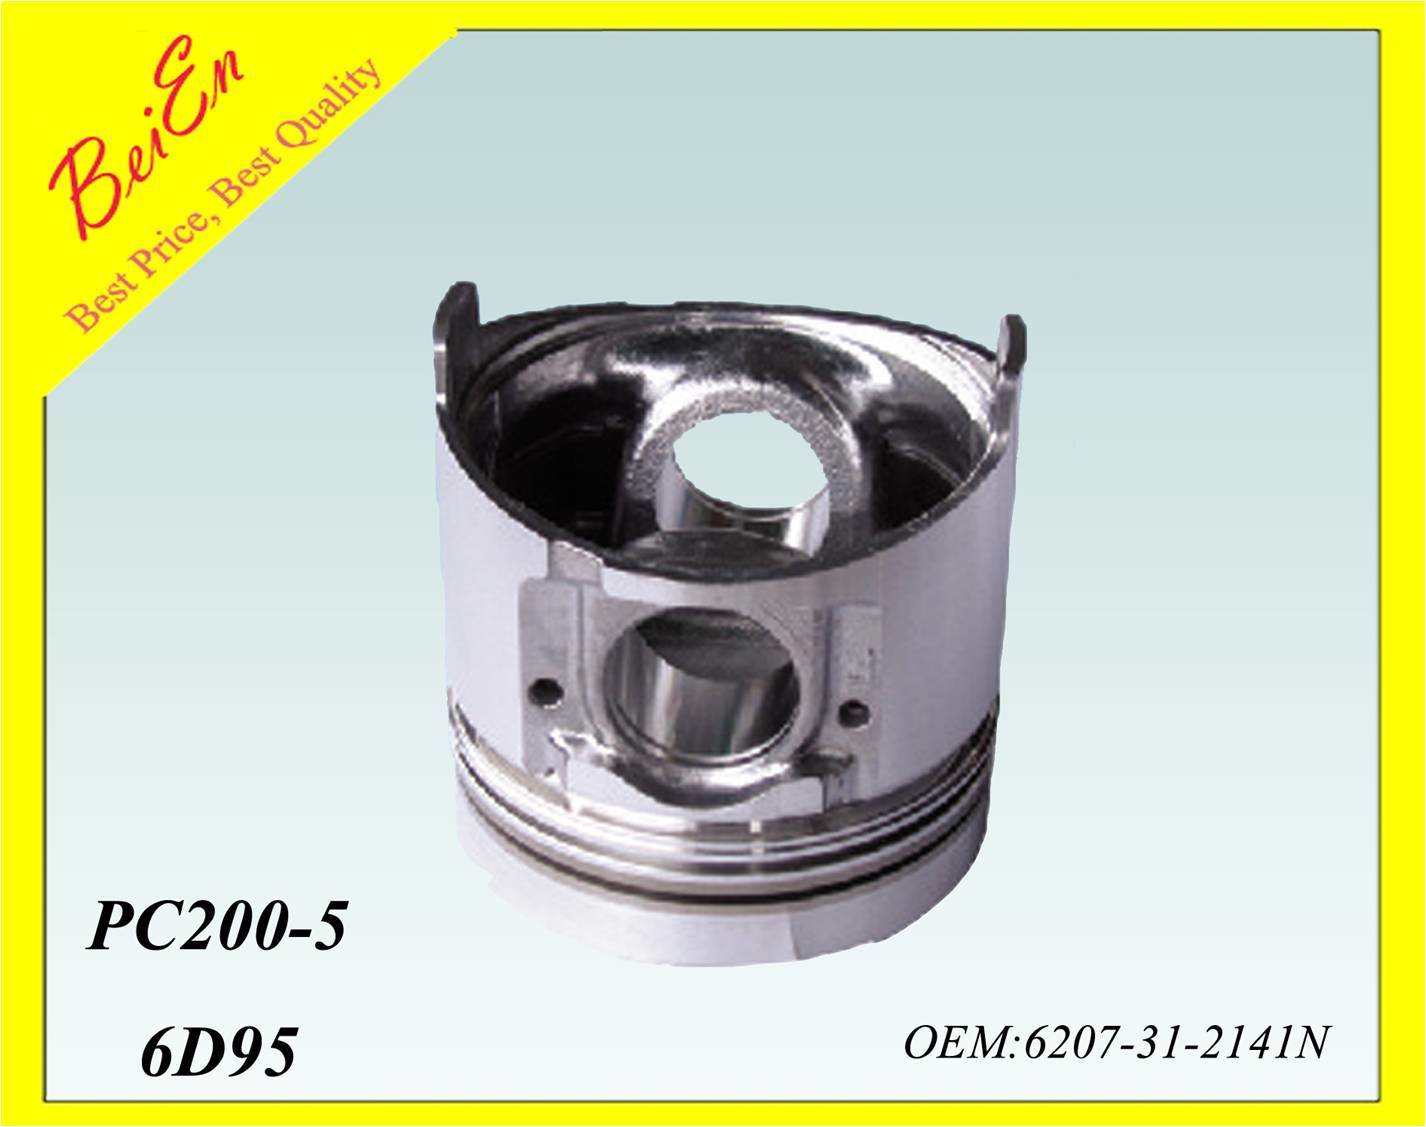 Pistion for Excavator Engine PC200-5 (Part number: 6207-31-2141N)